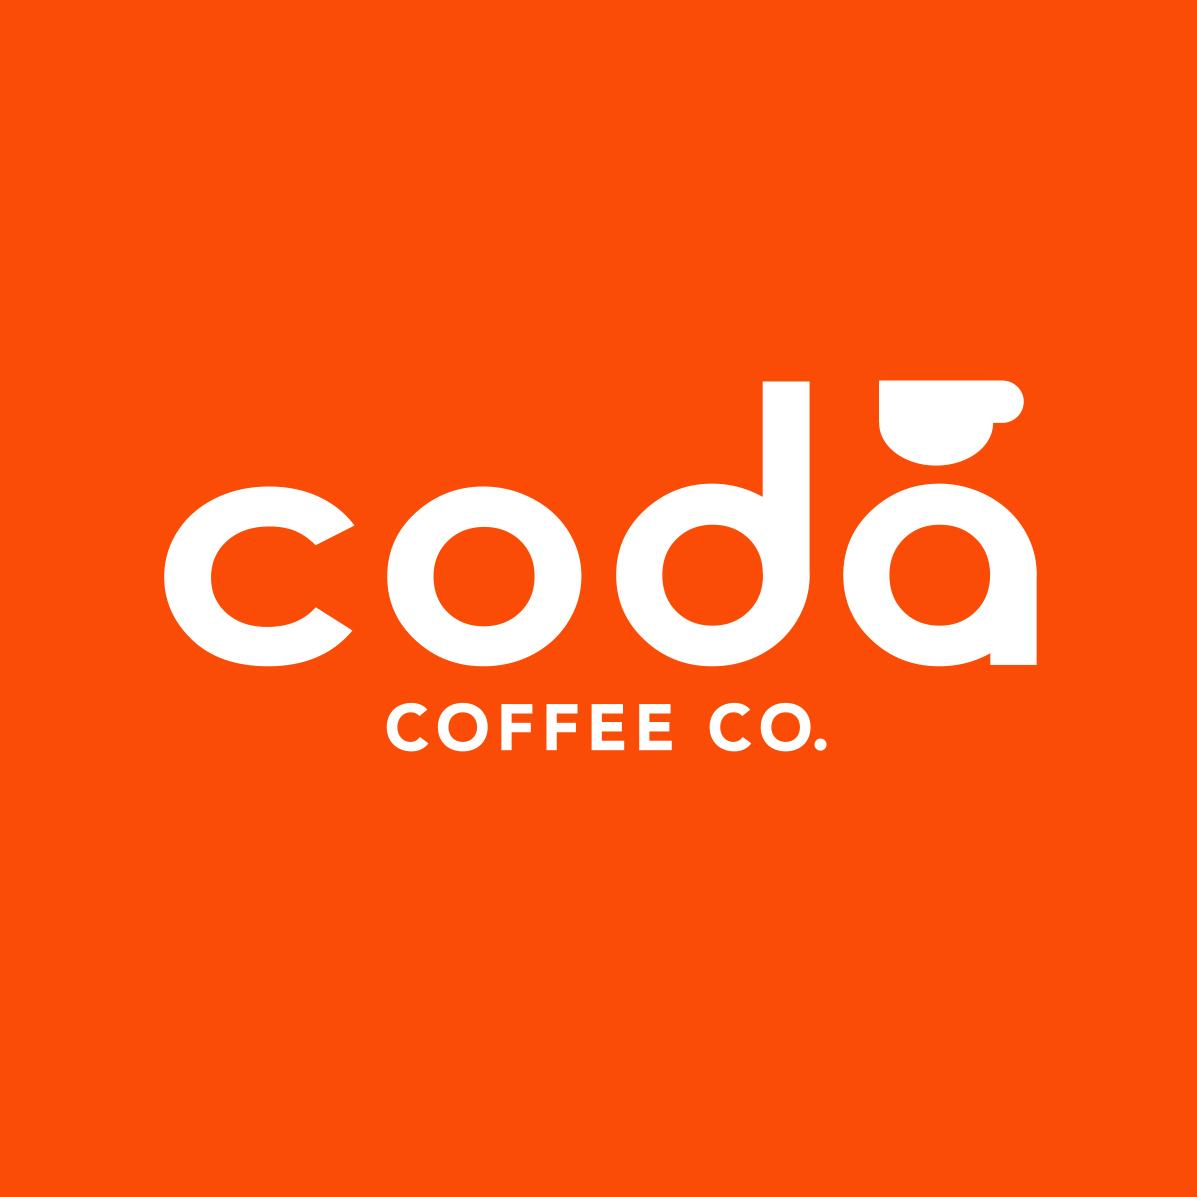 coda coffee company b-corp